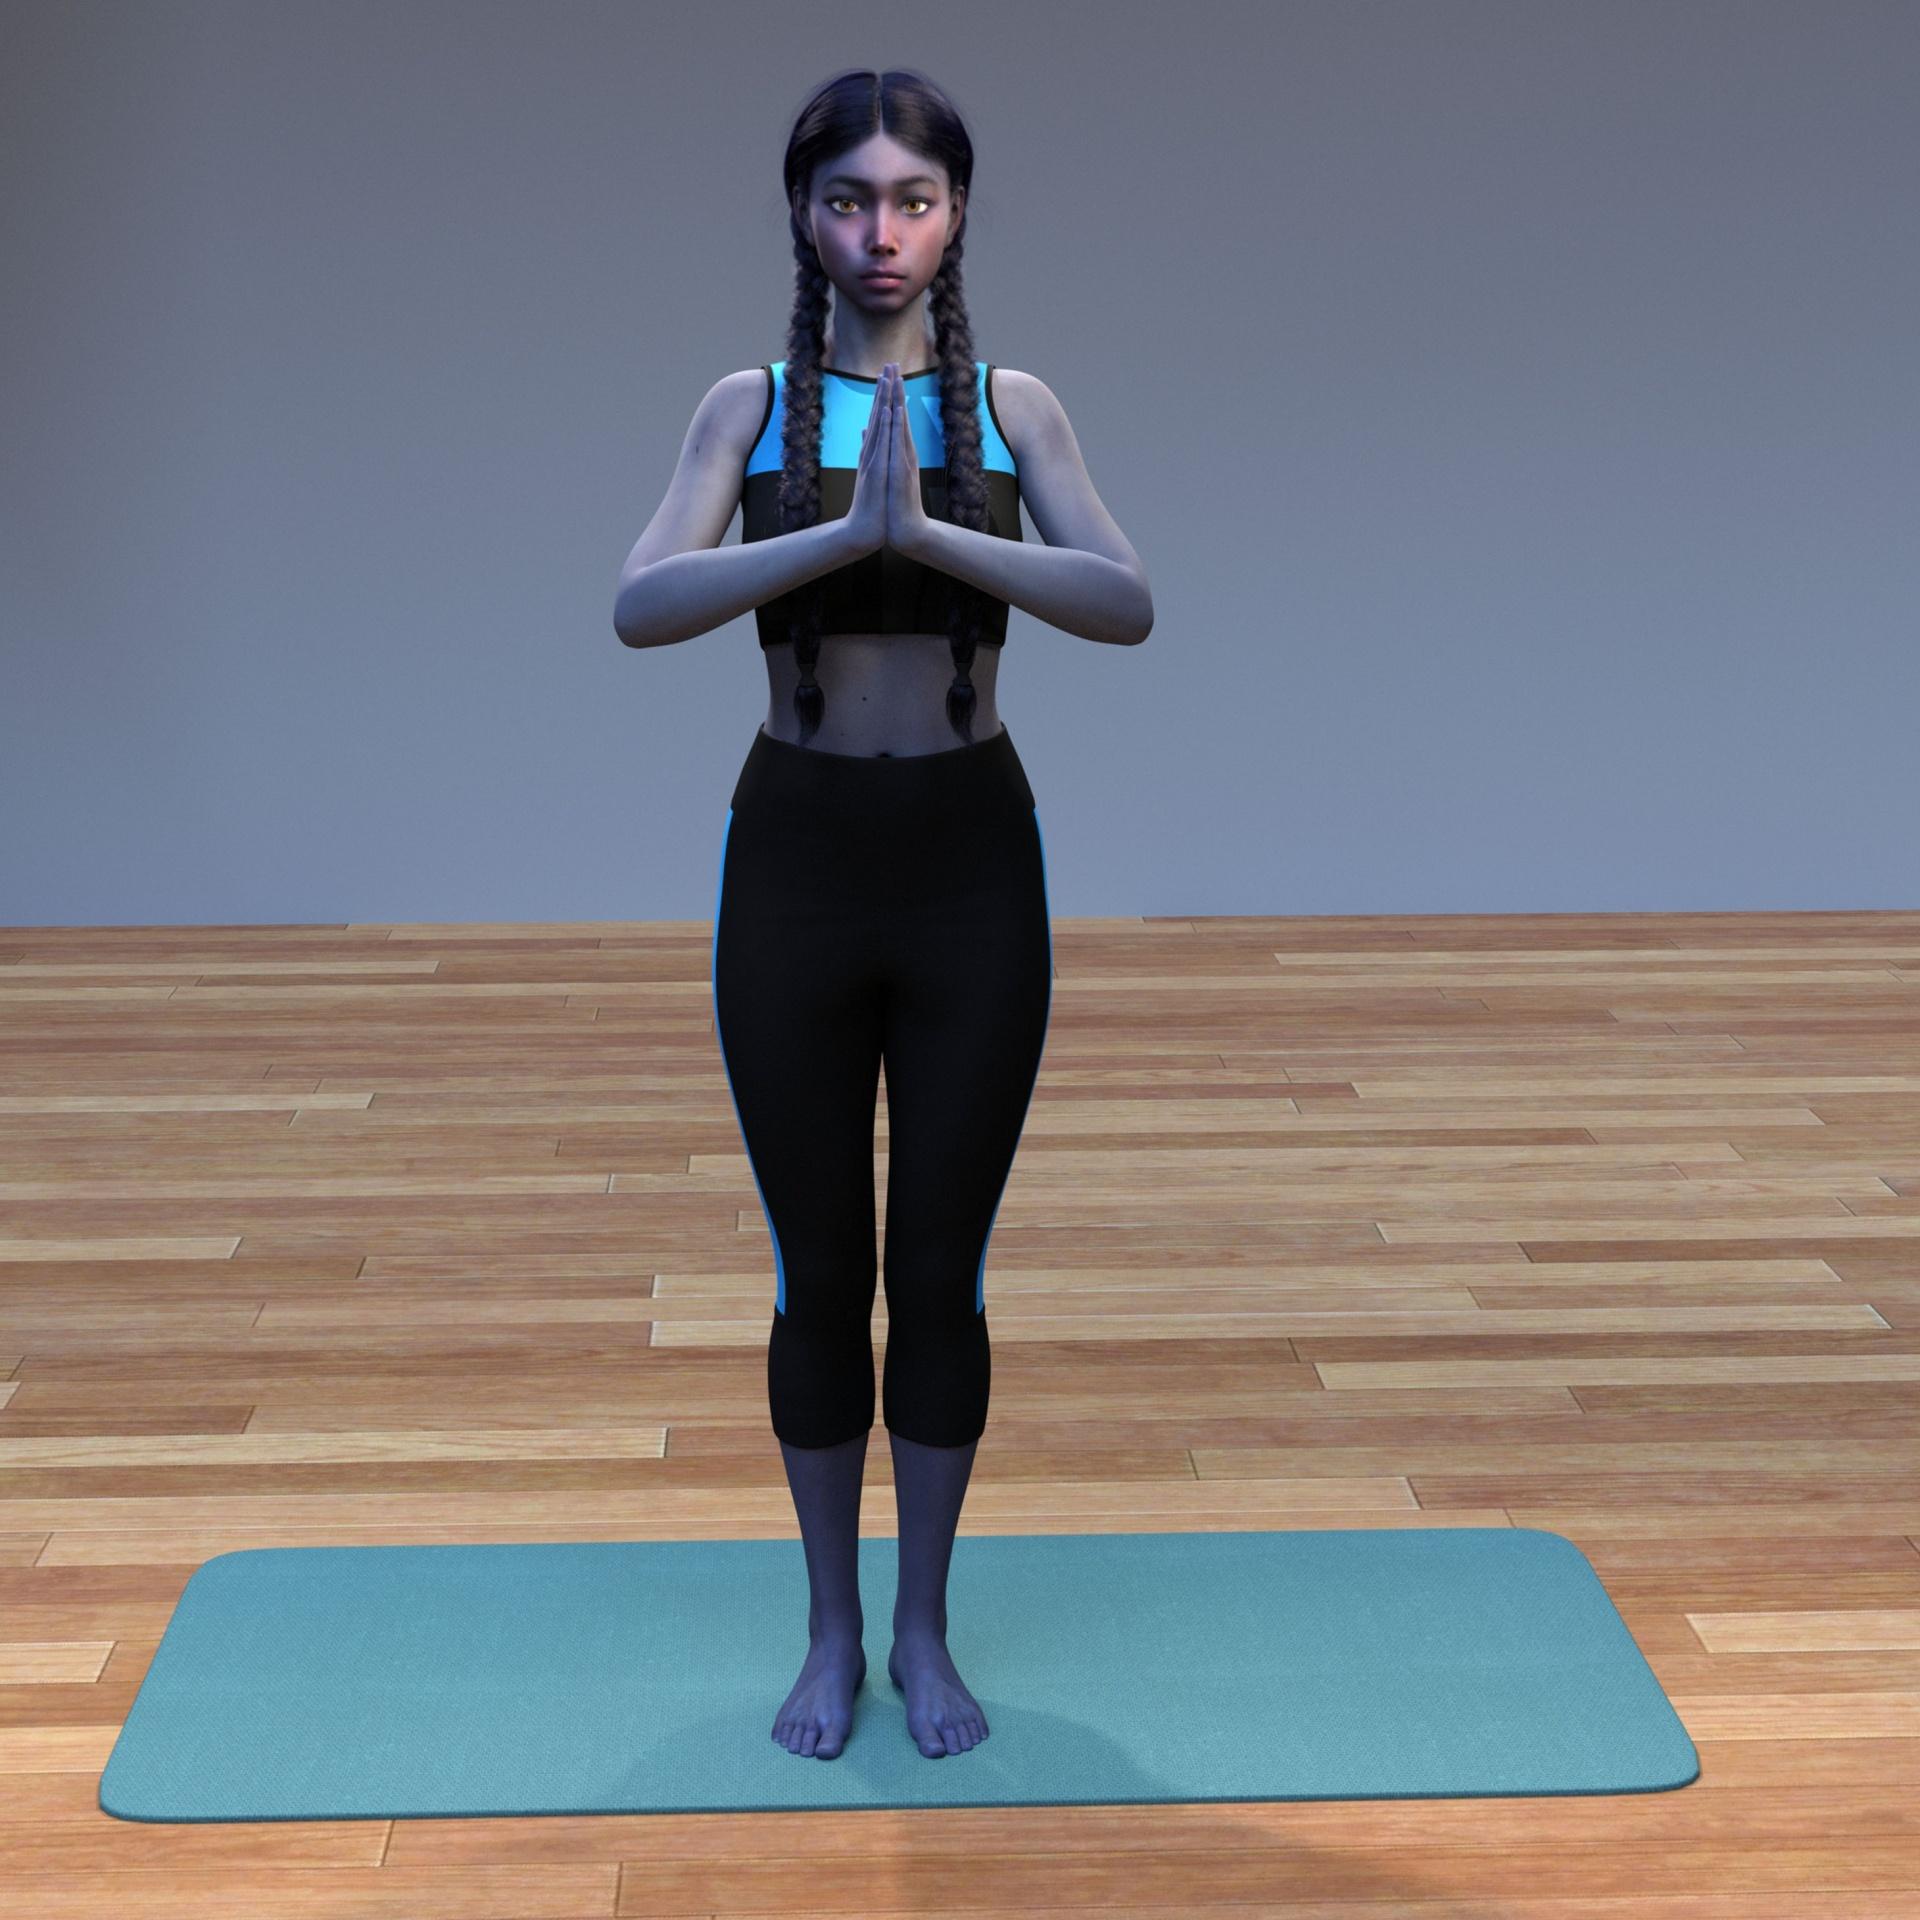 Yoga & Meditation Tools